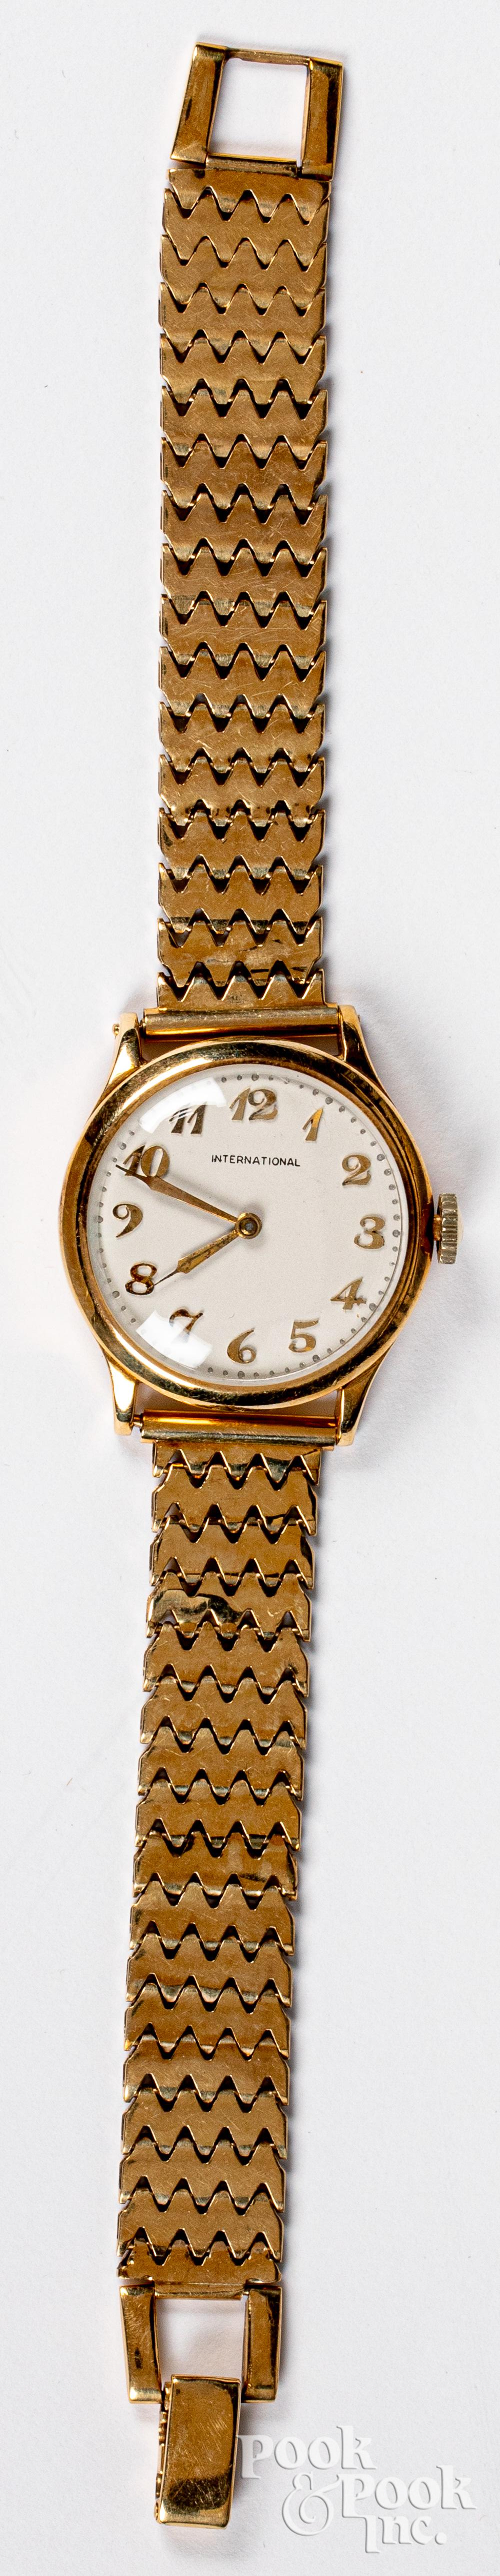 International 14K gold wristwatch, 27.7dwt.